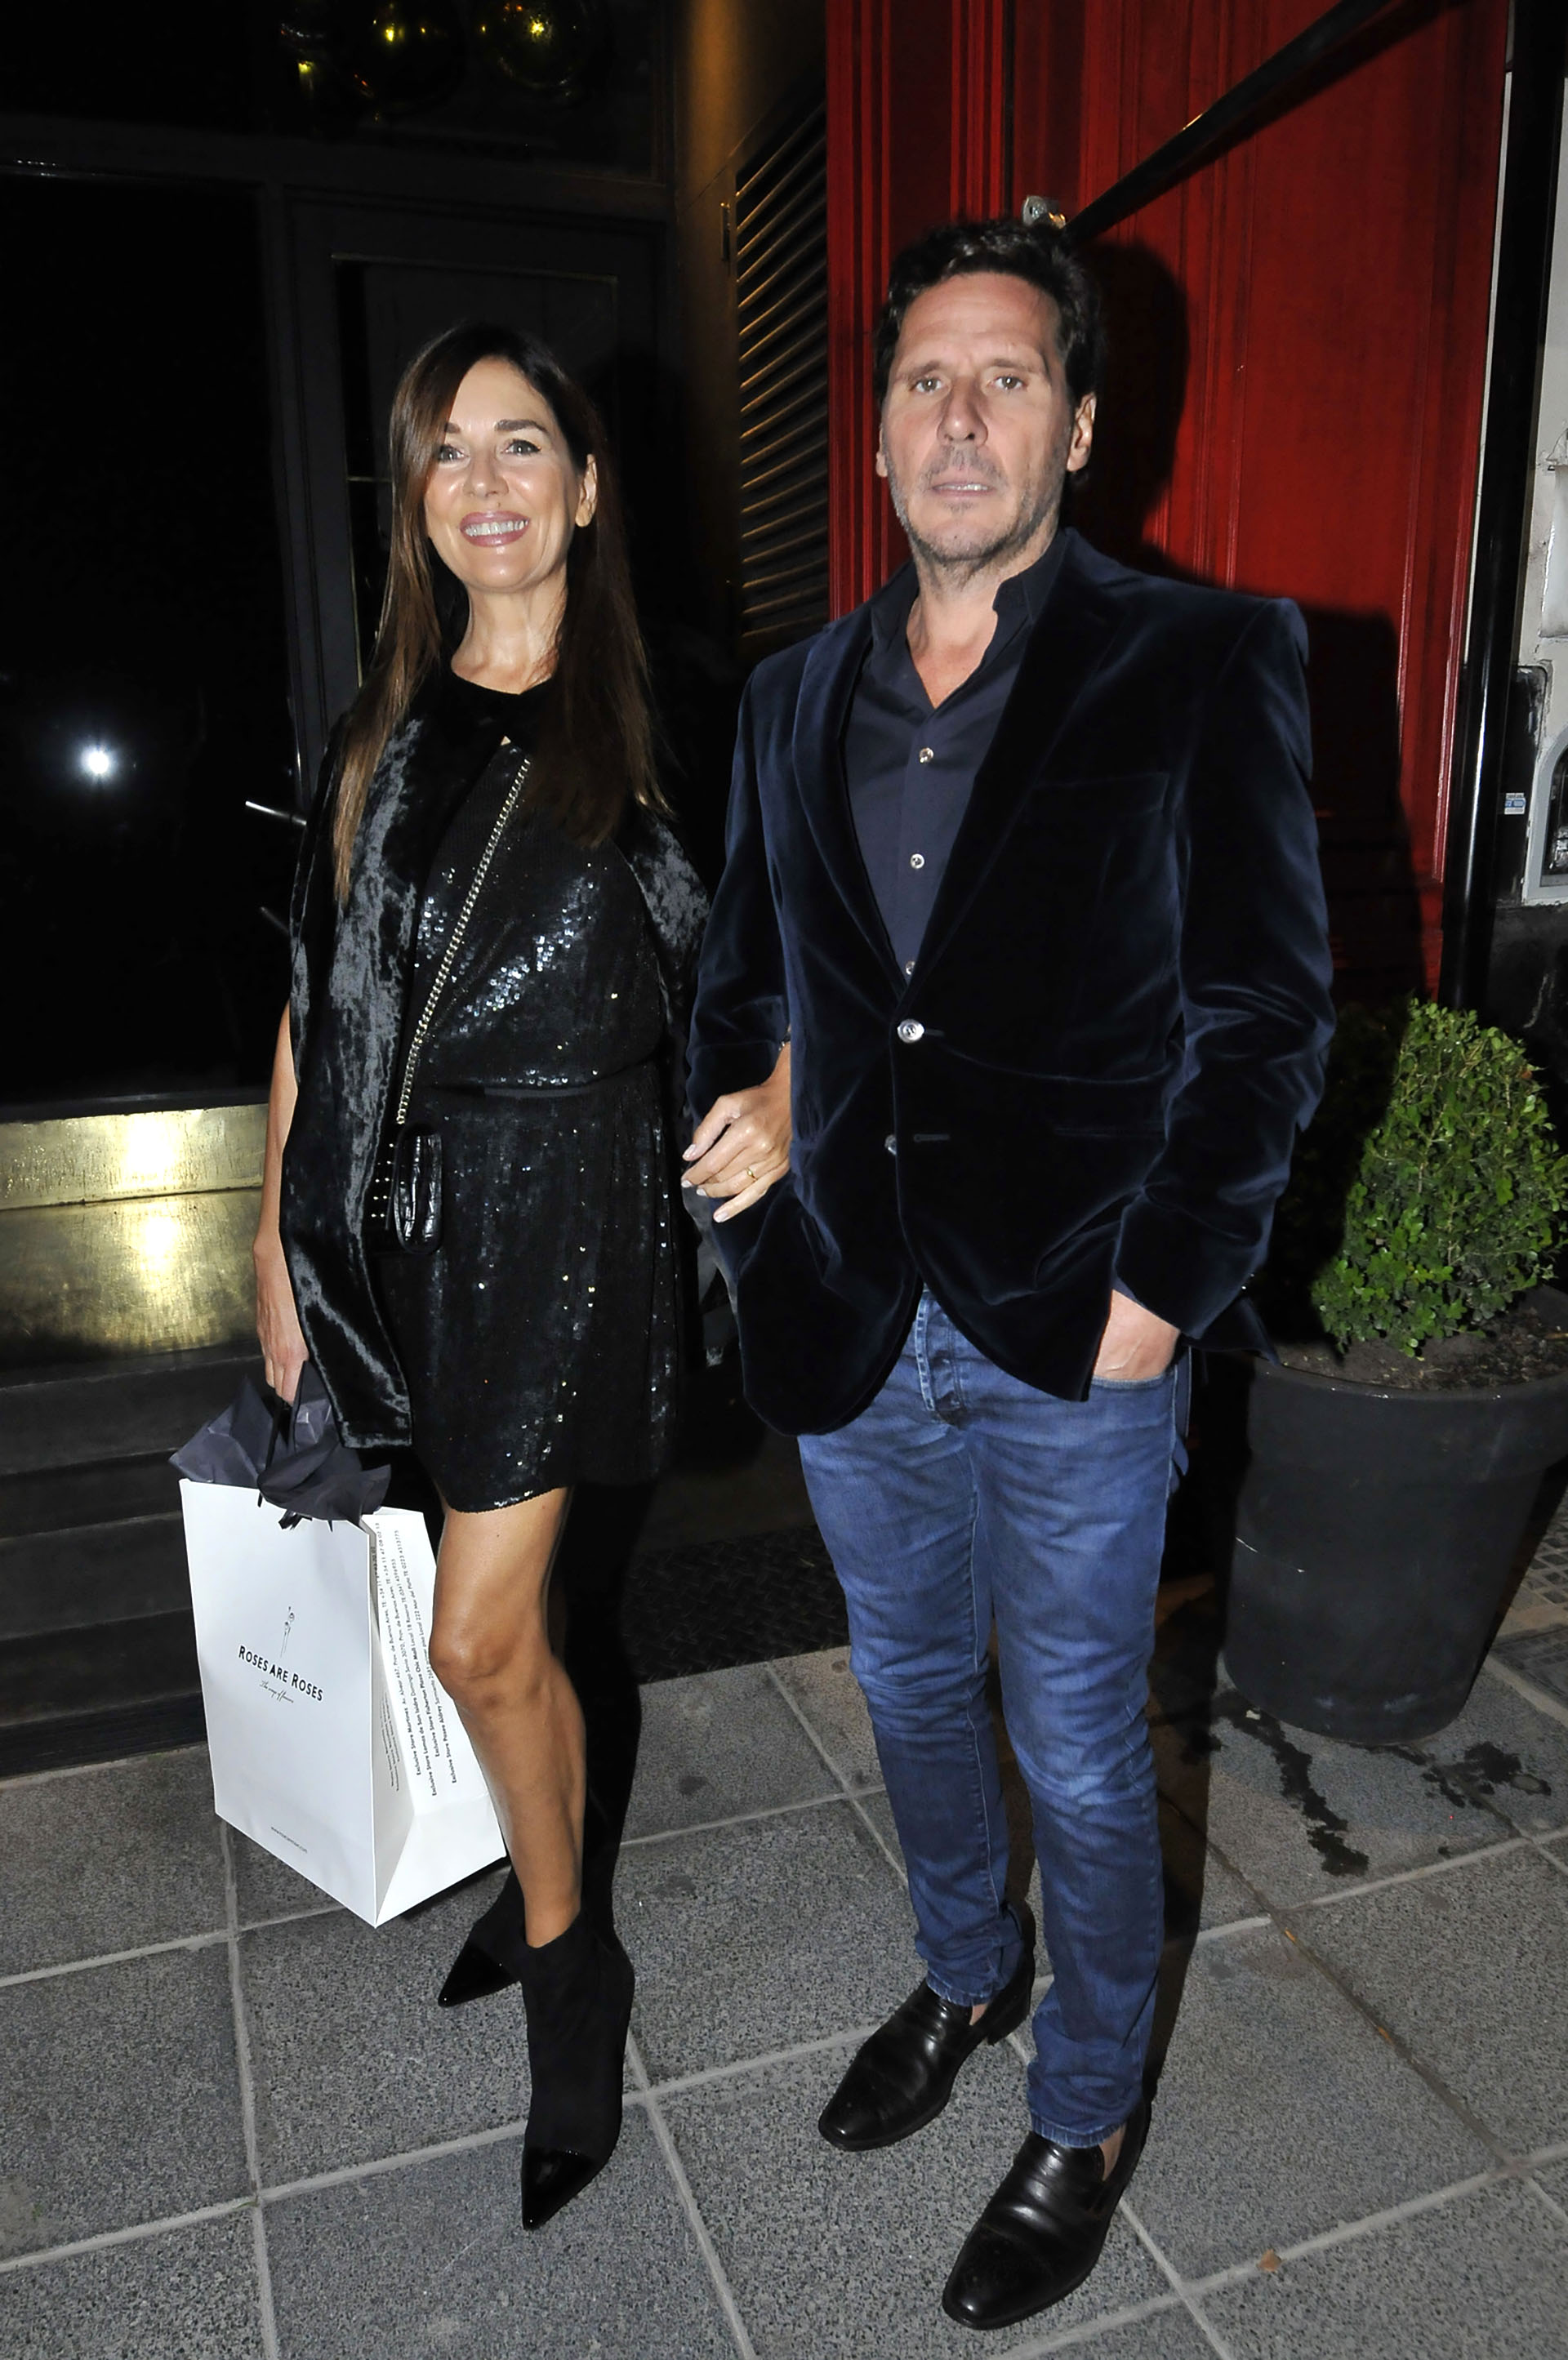 Andrea Frigerio llegó con Lucas Bocchino, su marido